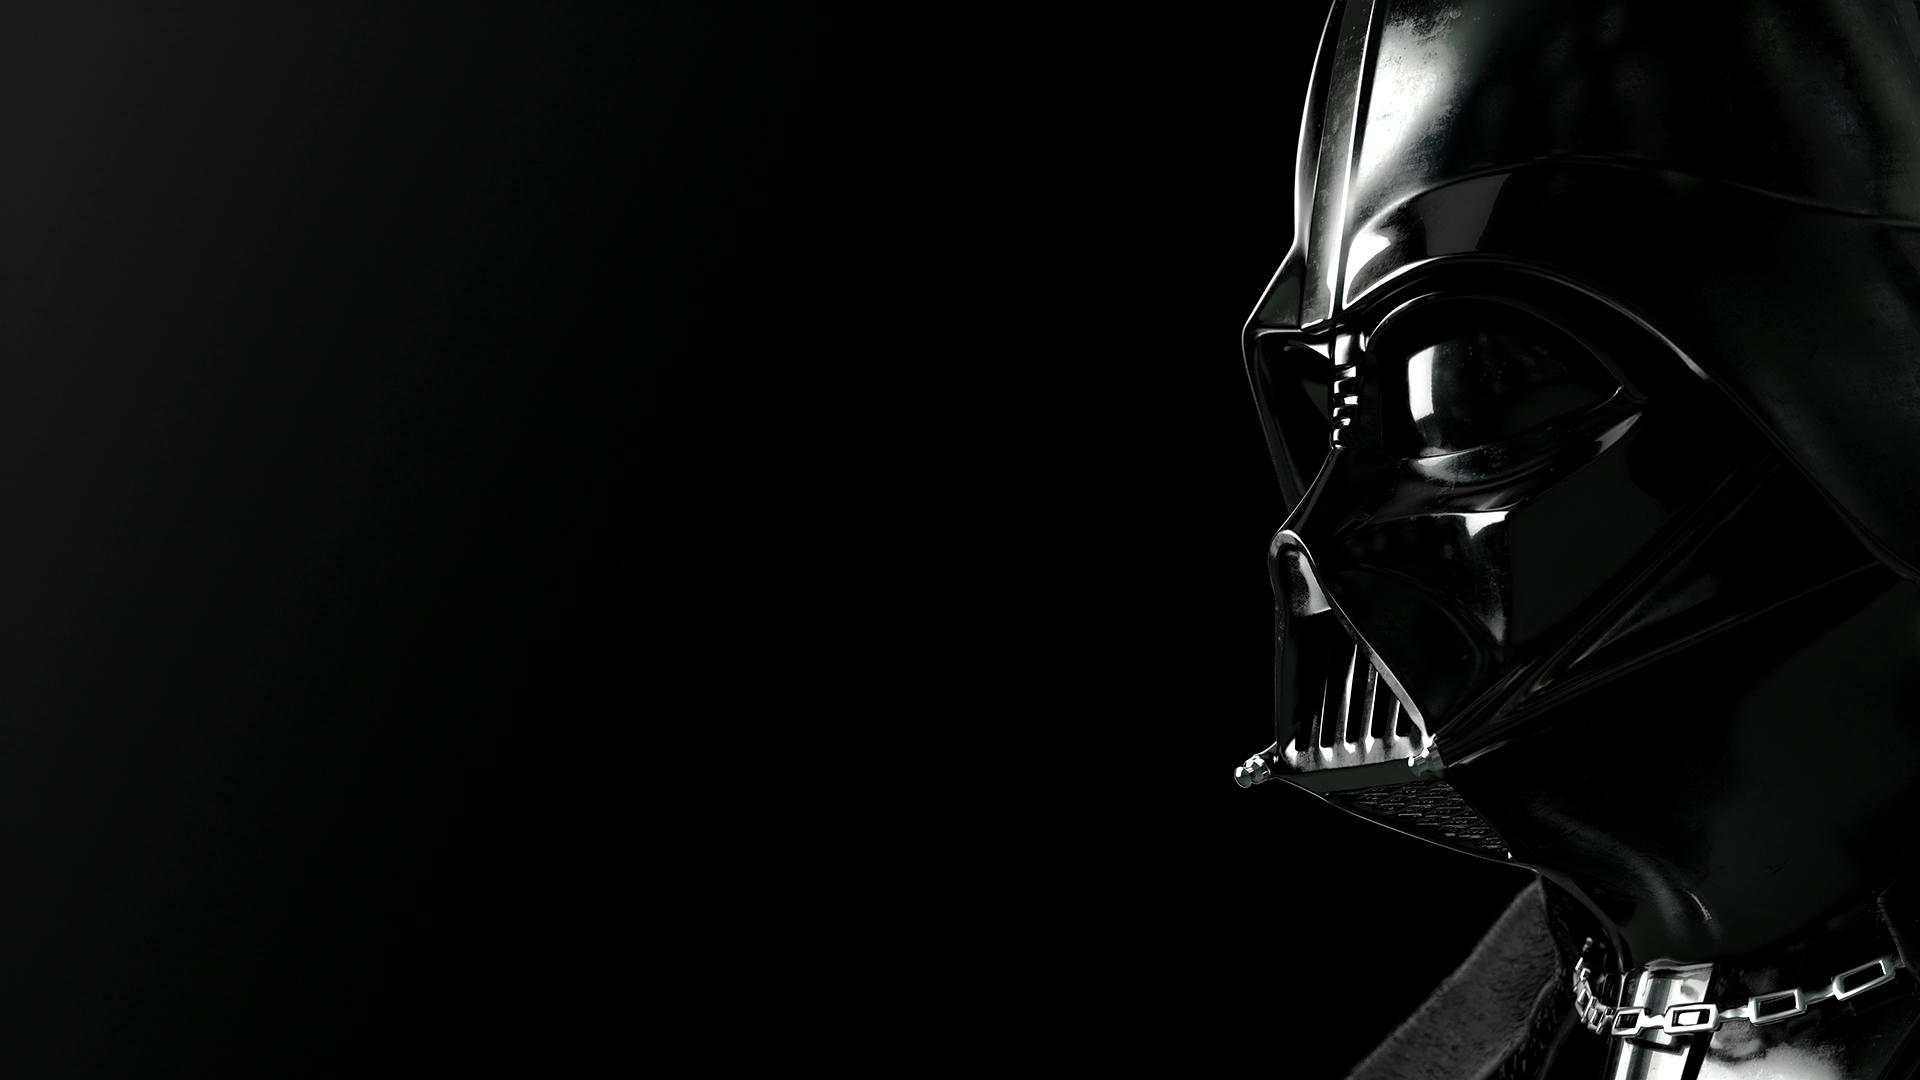 Desktop Darth Vader Wallpapers 1920x1080